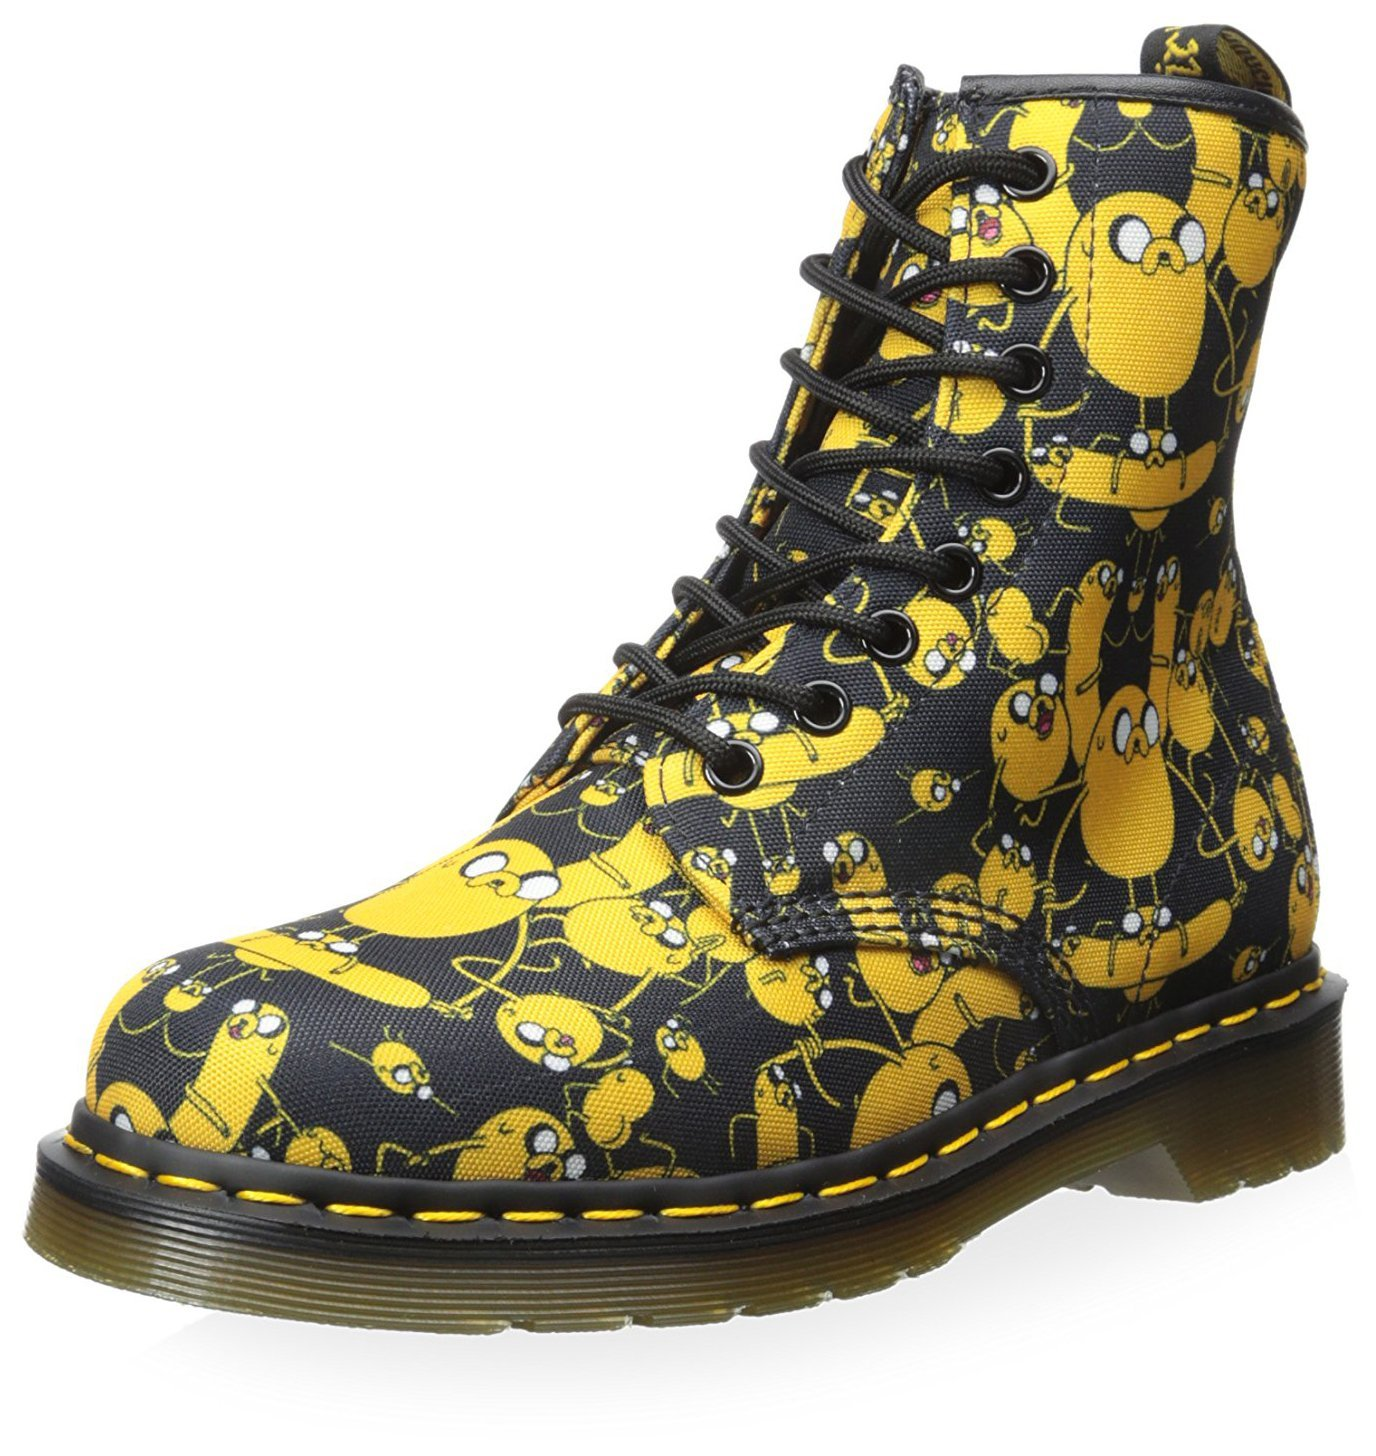 Giầy Dr. Martens Women's Castel 8 Eye Boot - Size 5 US/36 EU